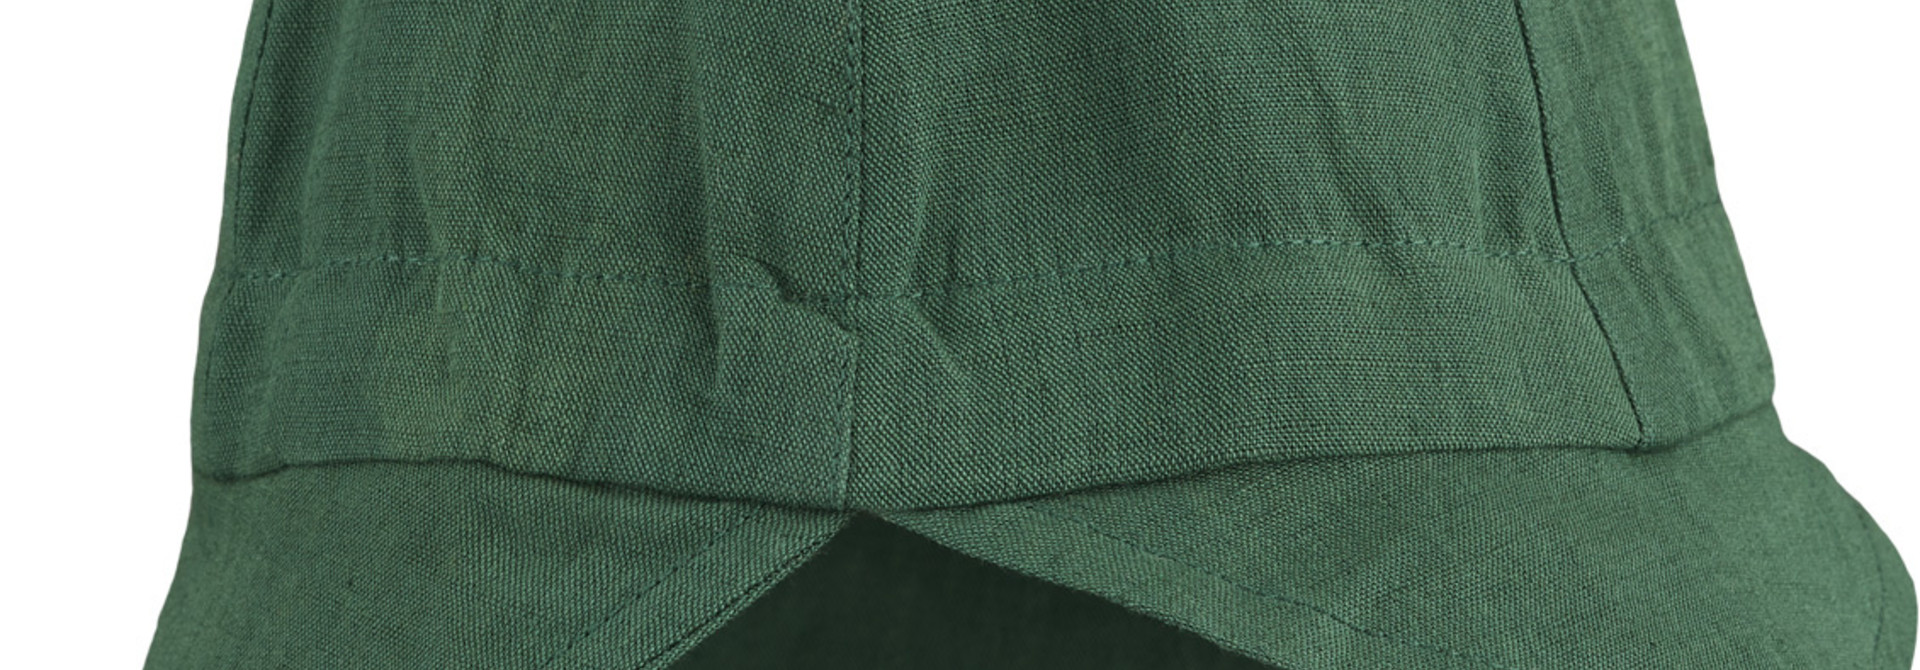 Eric sun hat - Garden green